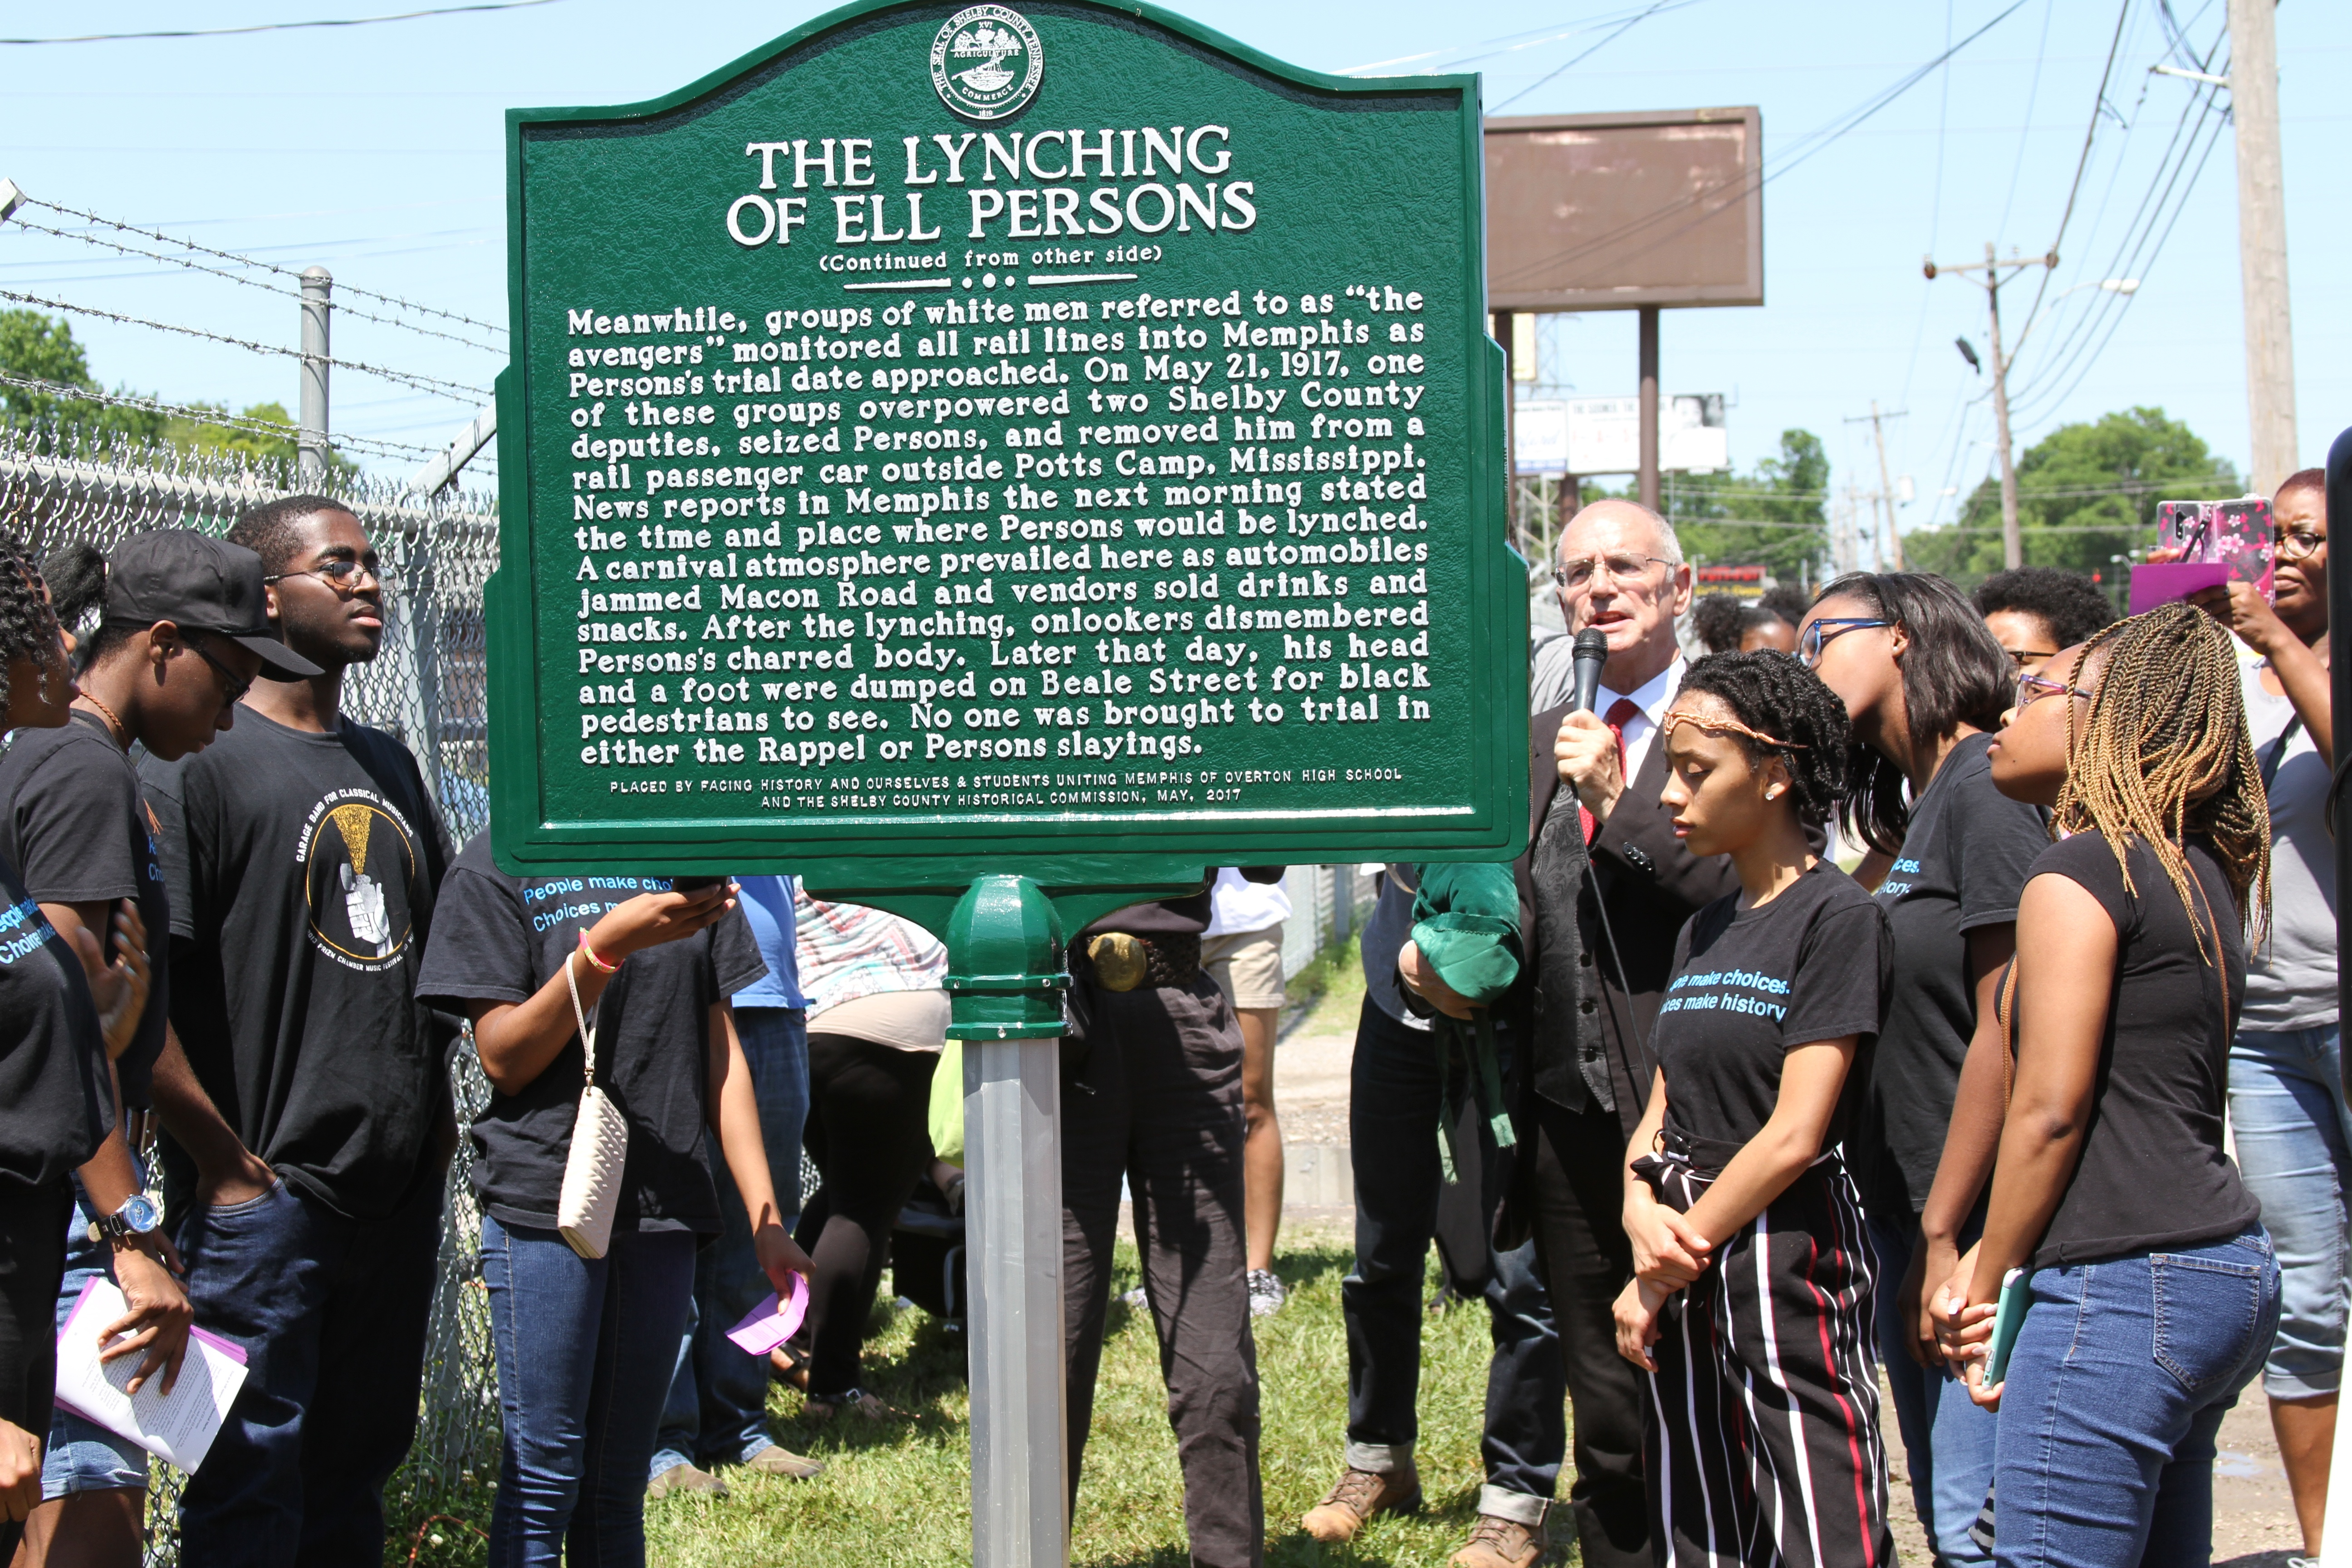 lynching memphis plaque students uniting memphis